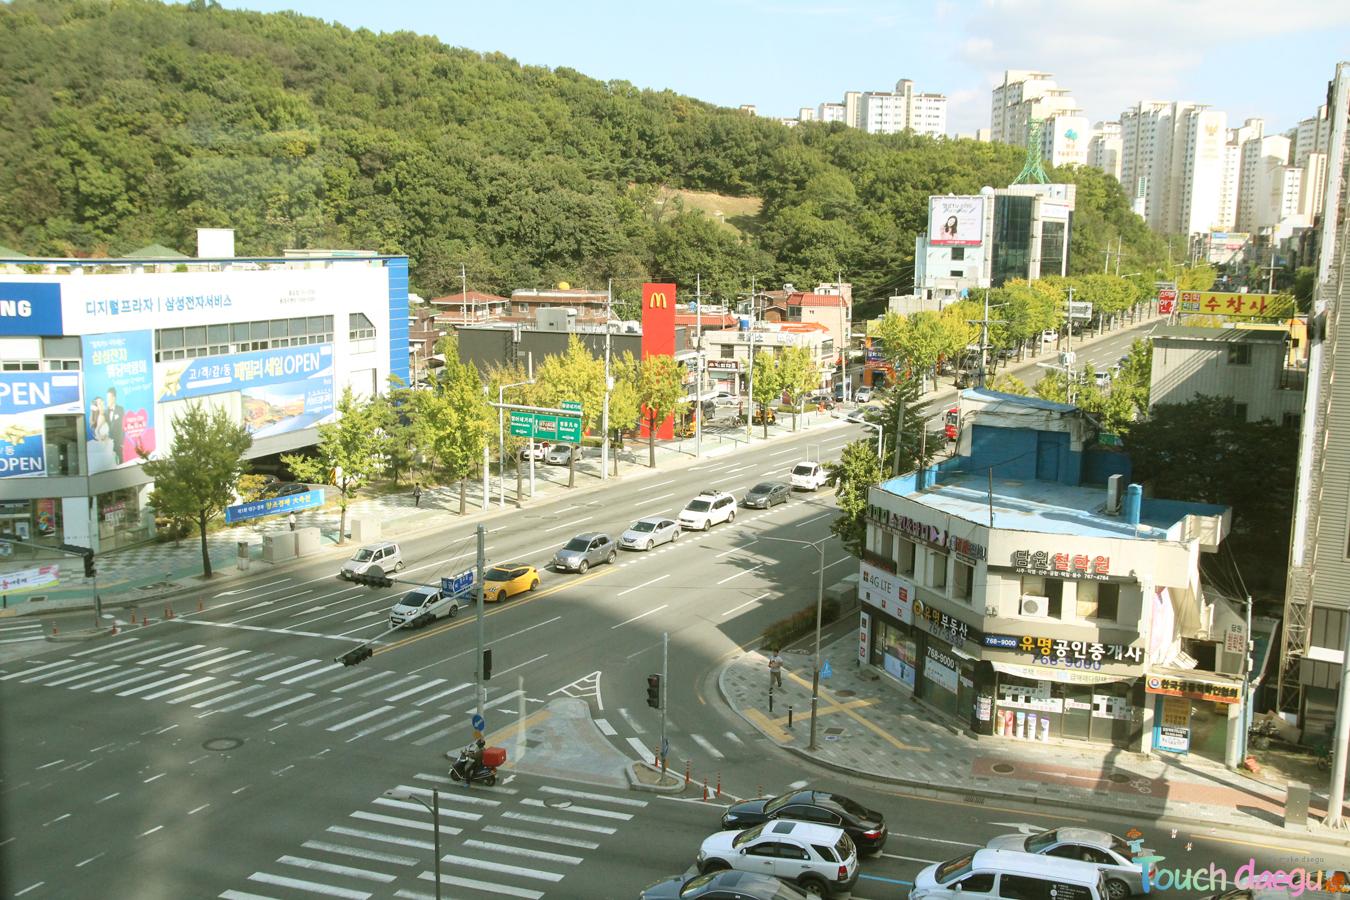 The view of Daegu city